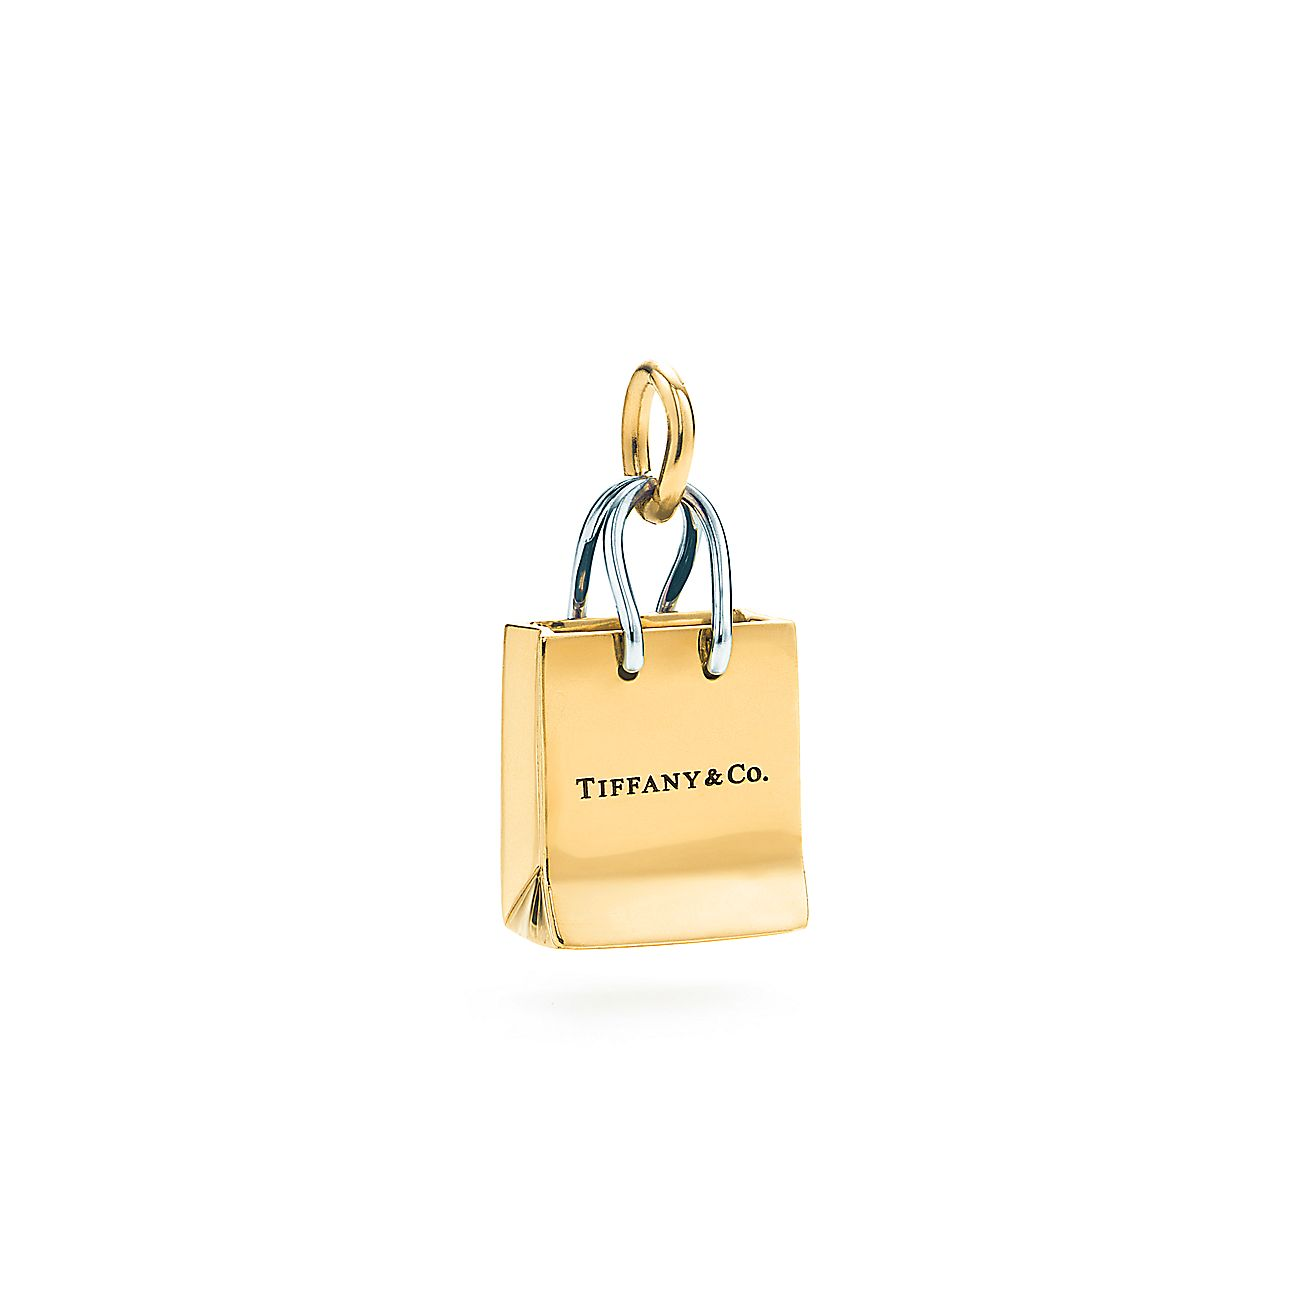 Tiffany & Co.®<br>Shopping Bag Charm